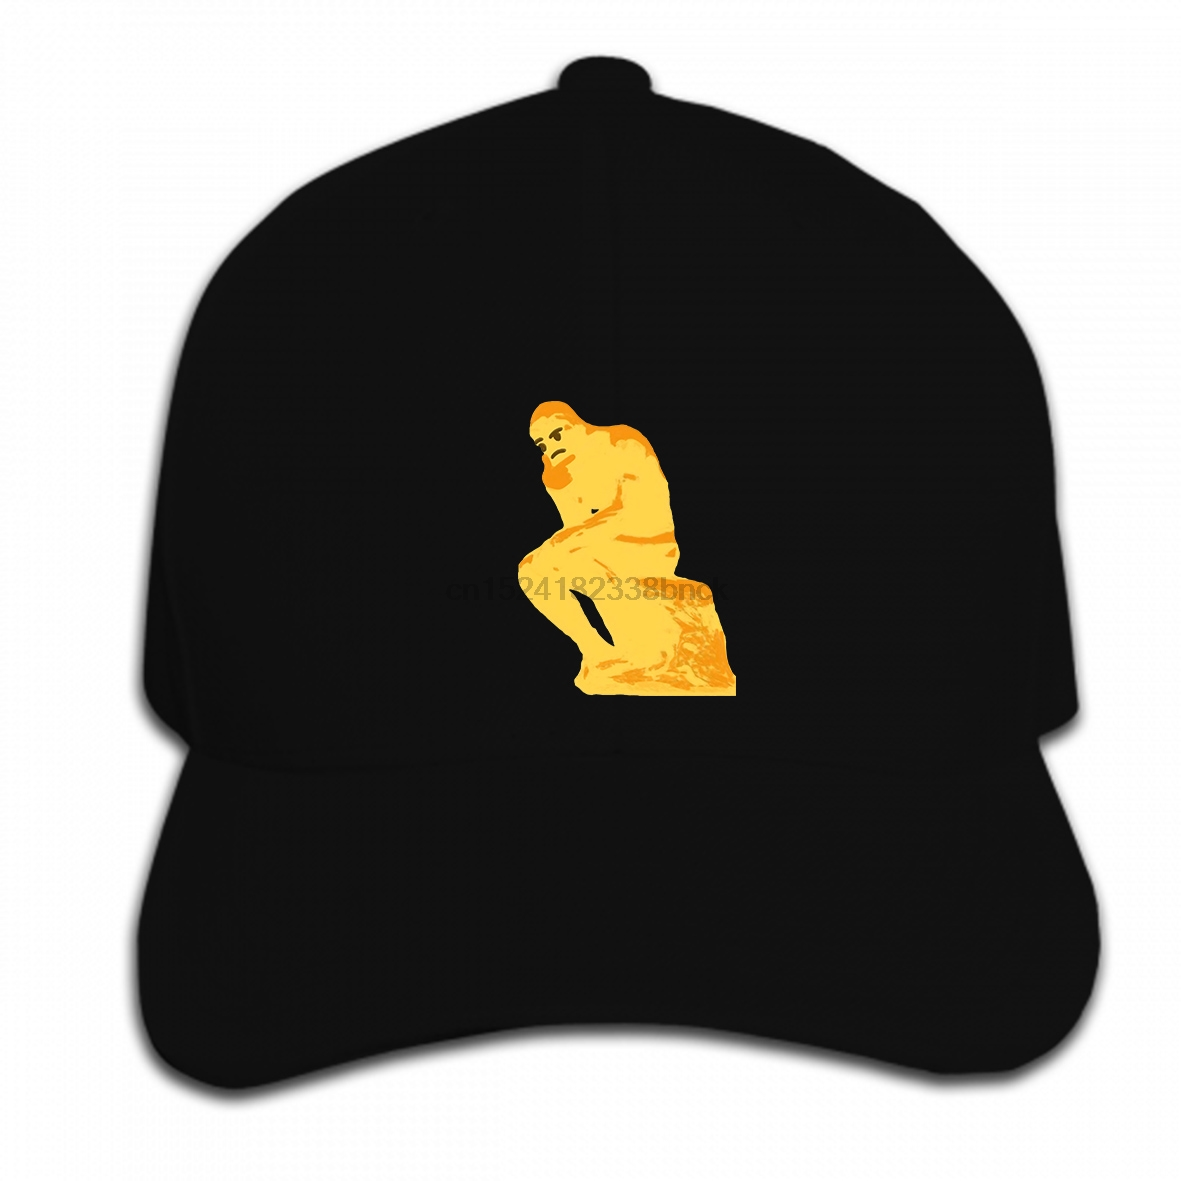 Mutter & Kinder Jungen Kleidung Kinder Jungen Mädchen Emoji Print Hip-hop Hut Populäre Justierbare Baseballmütze